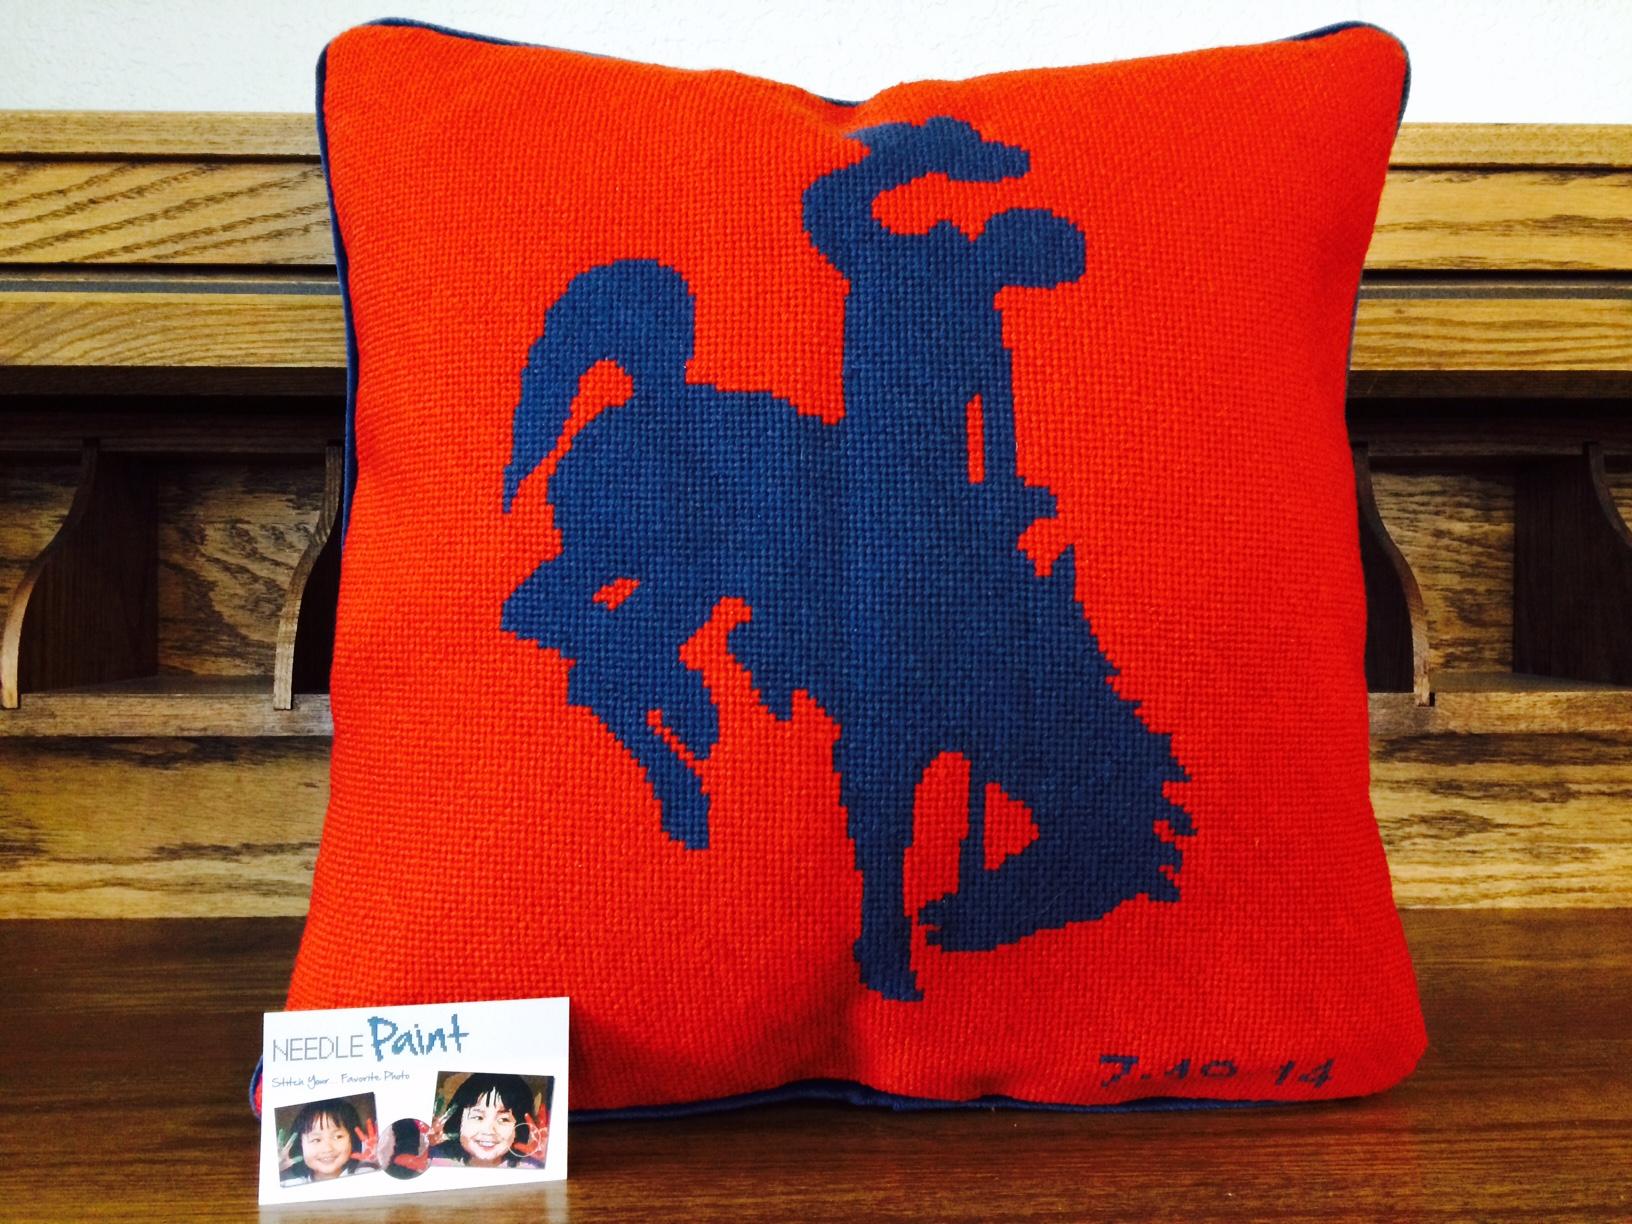 Jackson Hole Needlepoint Pillow